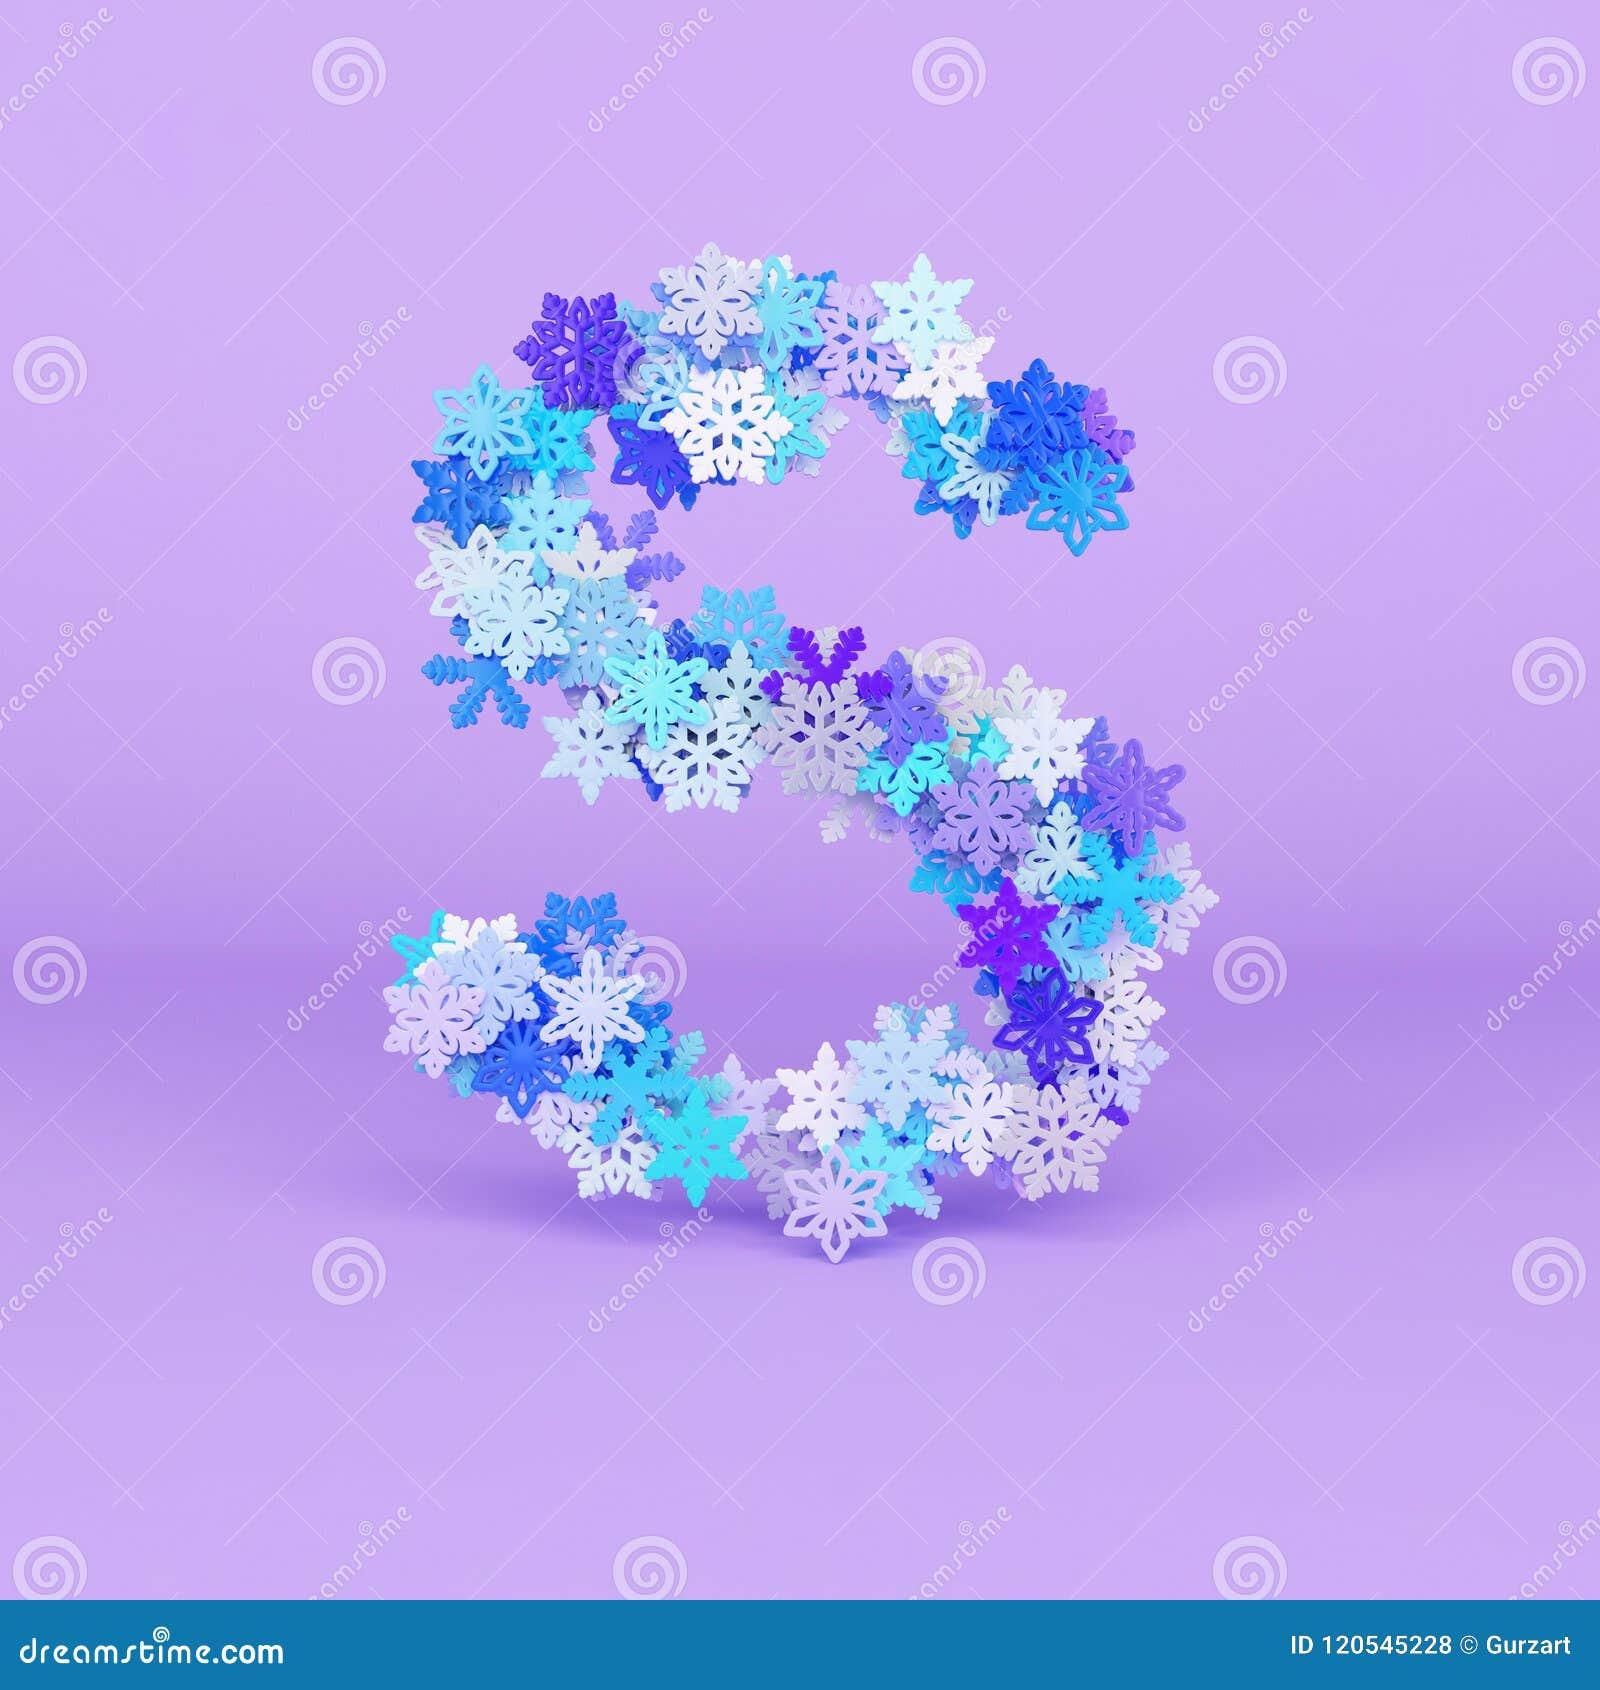 Winter Alphabet Letter S Uppercase Christmas Font Made Of